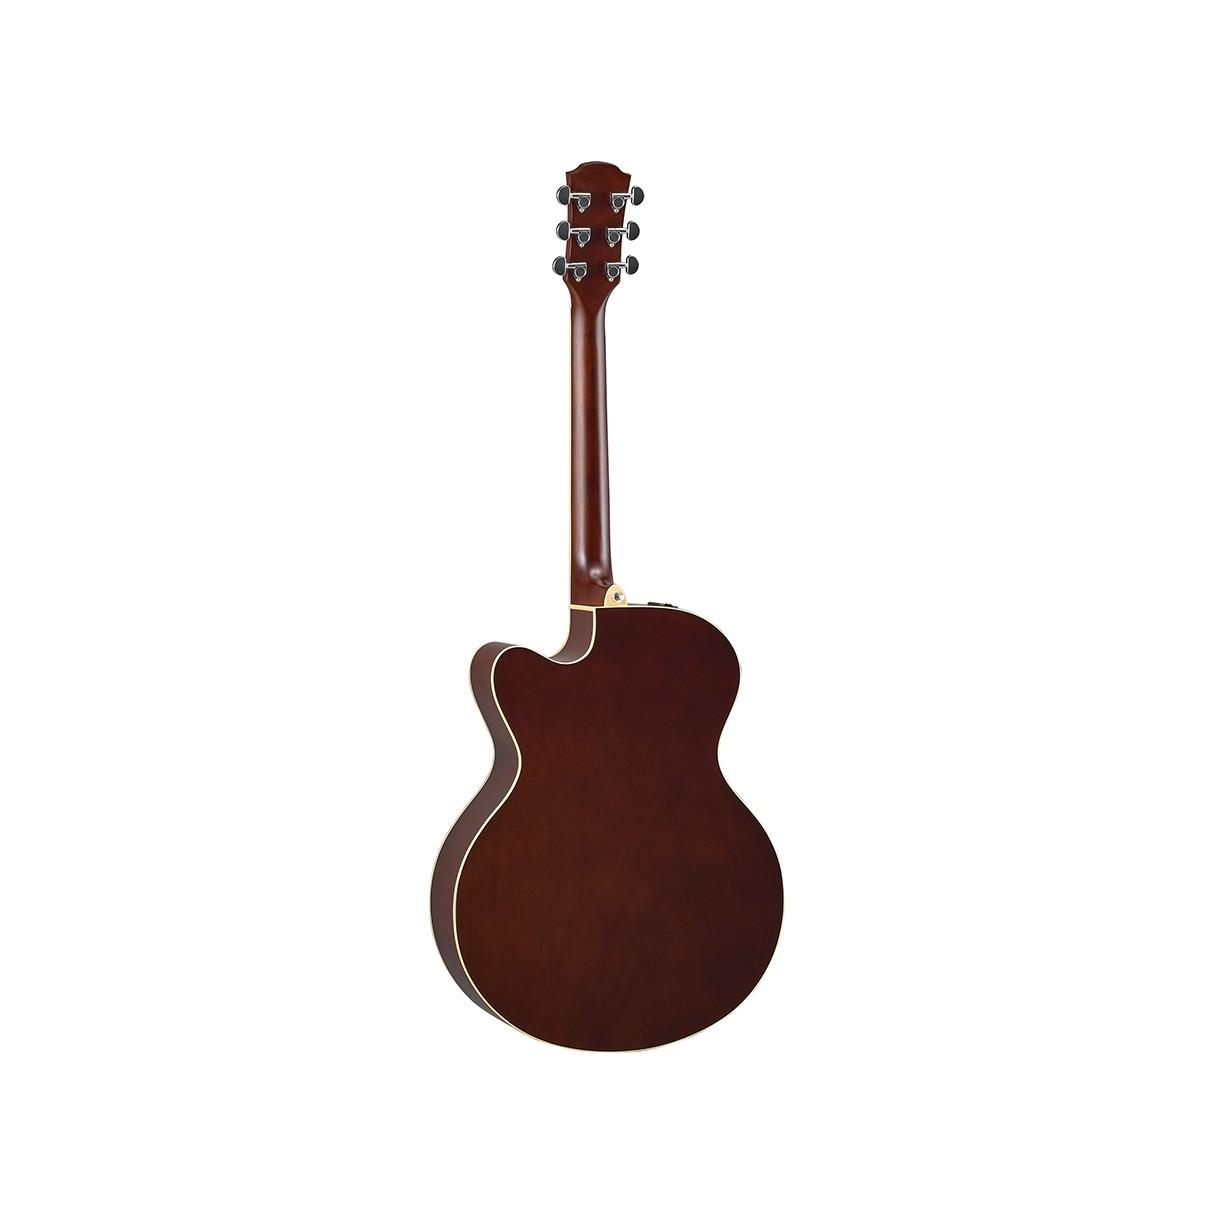 yamaha cpx600 old violin sunburst medium jumbo cutaway acoustic electric guitar. Black Bedroom Furniture Sets. Home Design Ideas